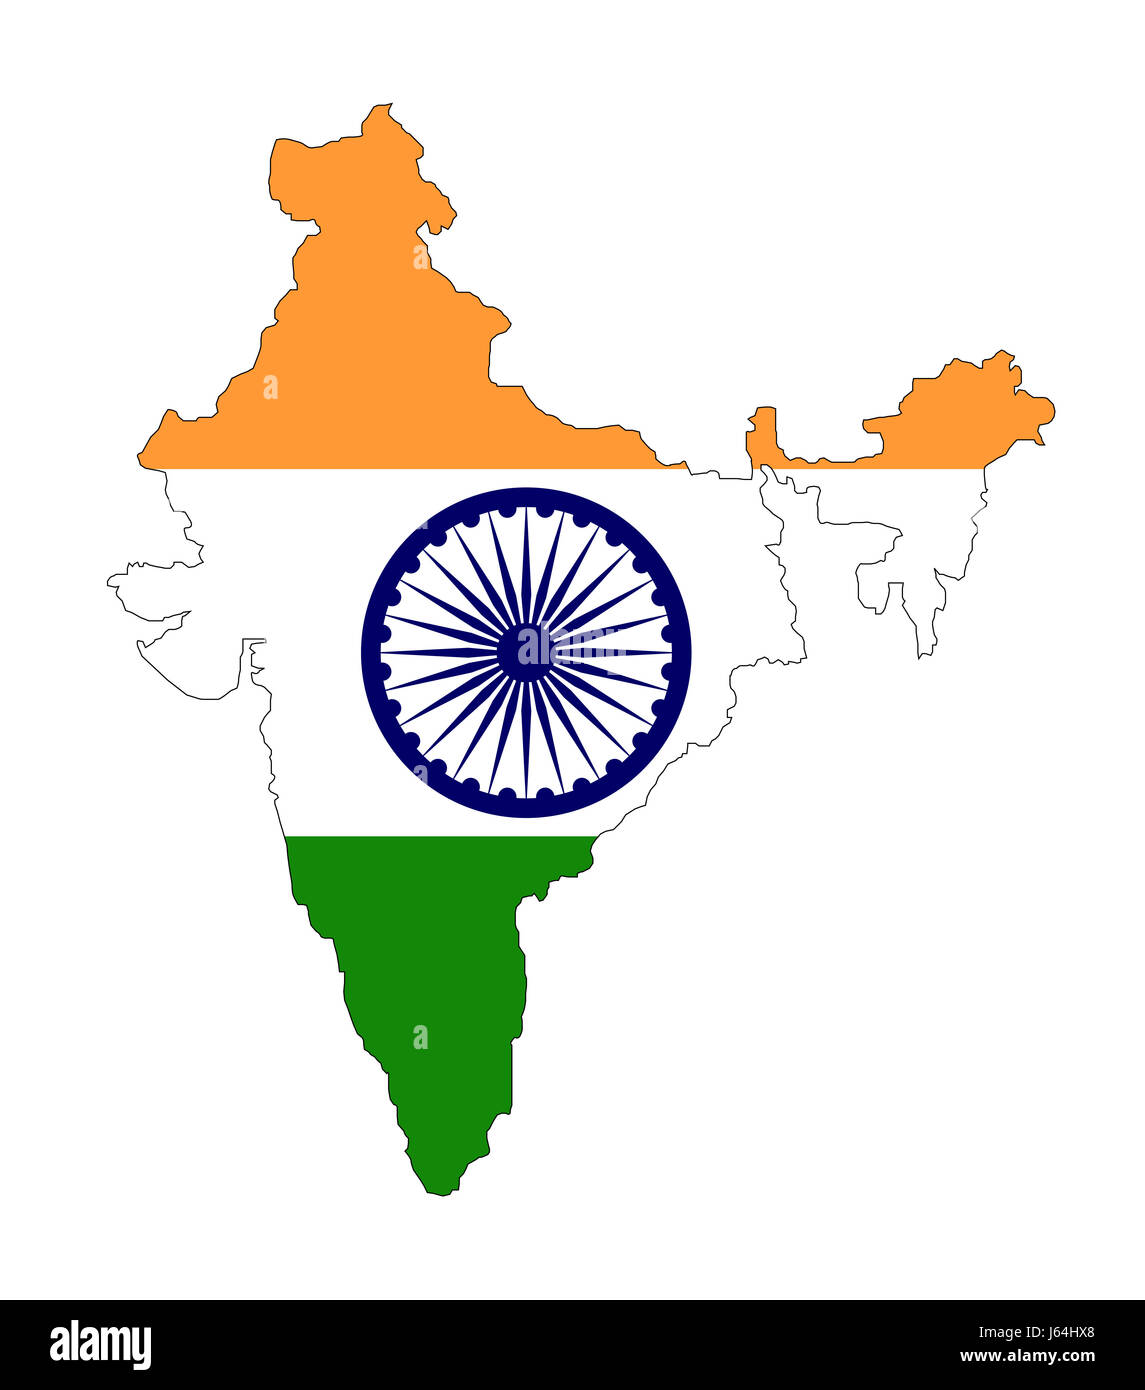 Carte Asie Inde.Drapeau De L Inde Asie Atlas Des Cartes Carte Du Monde Asie